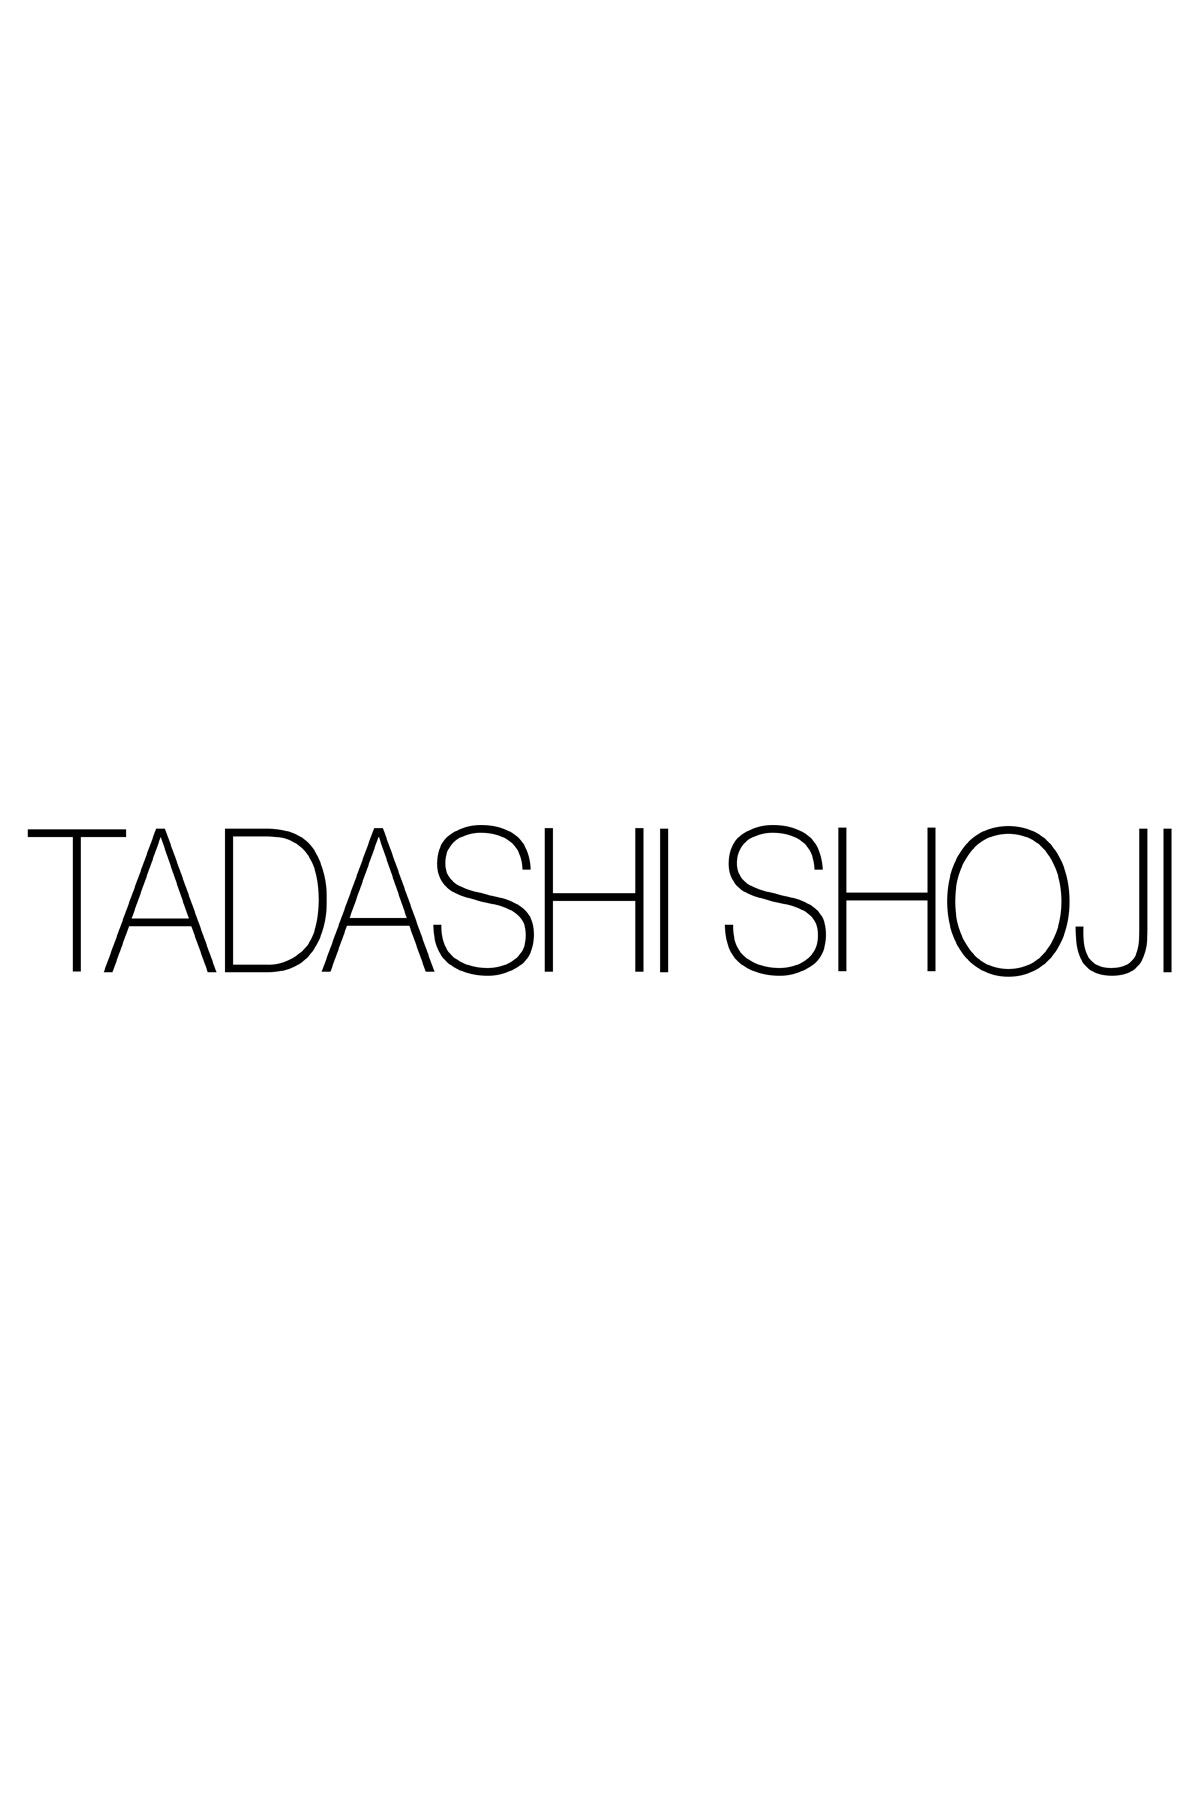 Tadashi Shoji - Kinglet Gown - Detail